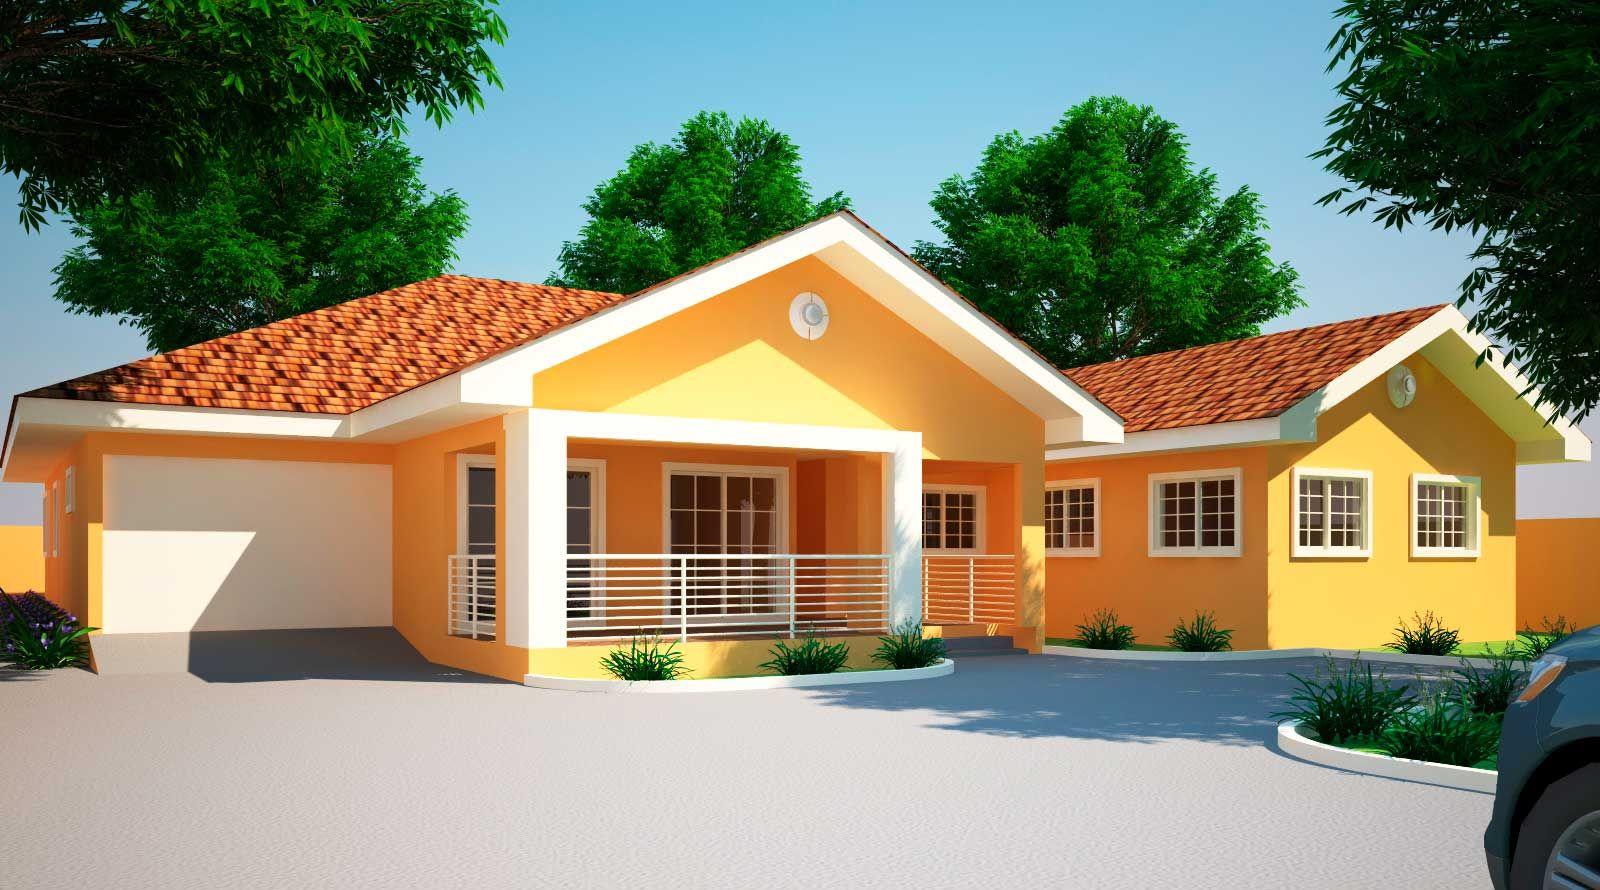 4 Bedroom House Plan Ghana